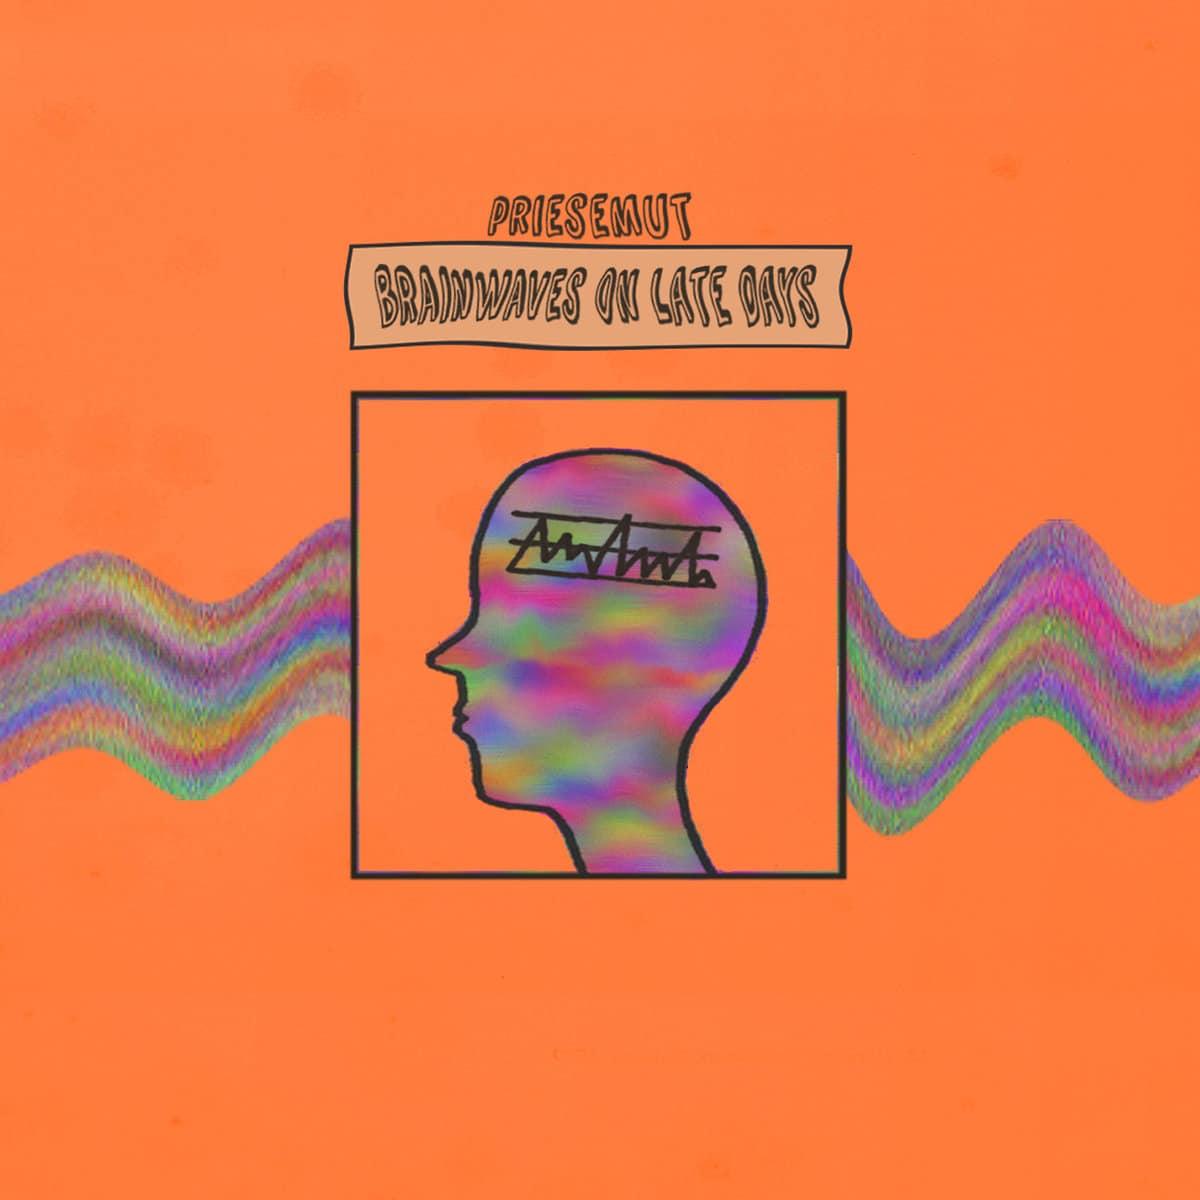 Priesemut - Brainwaves On Late Days - Sichtexot - Bandcamp